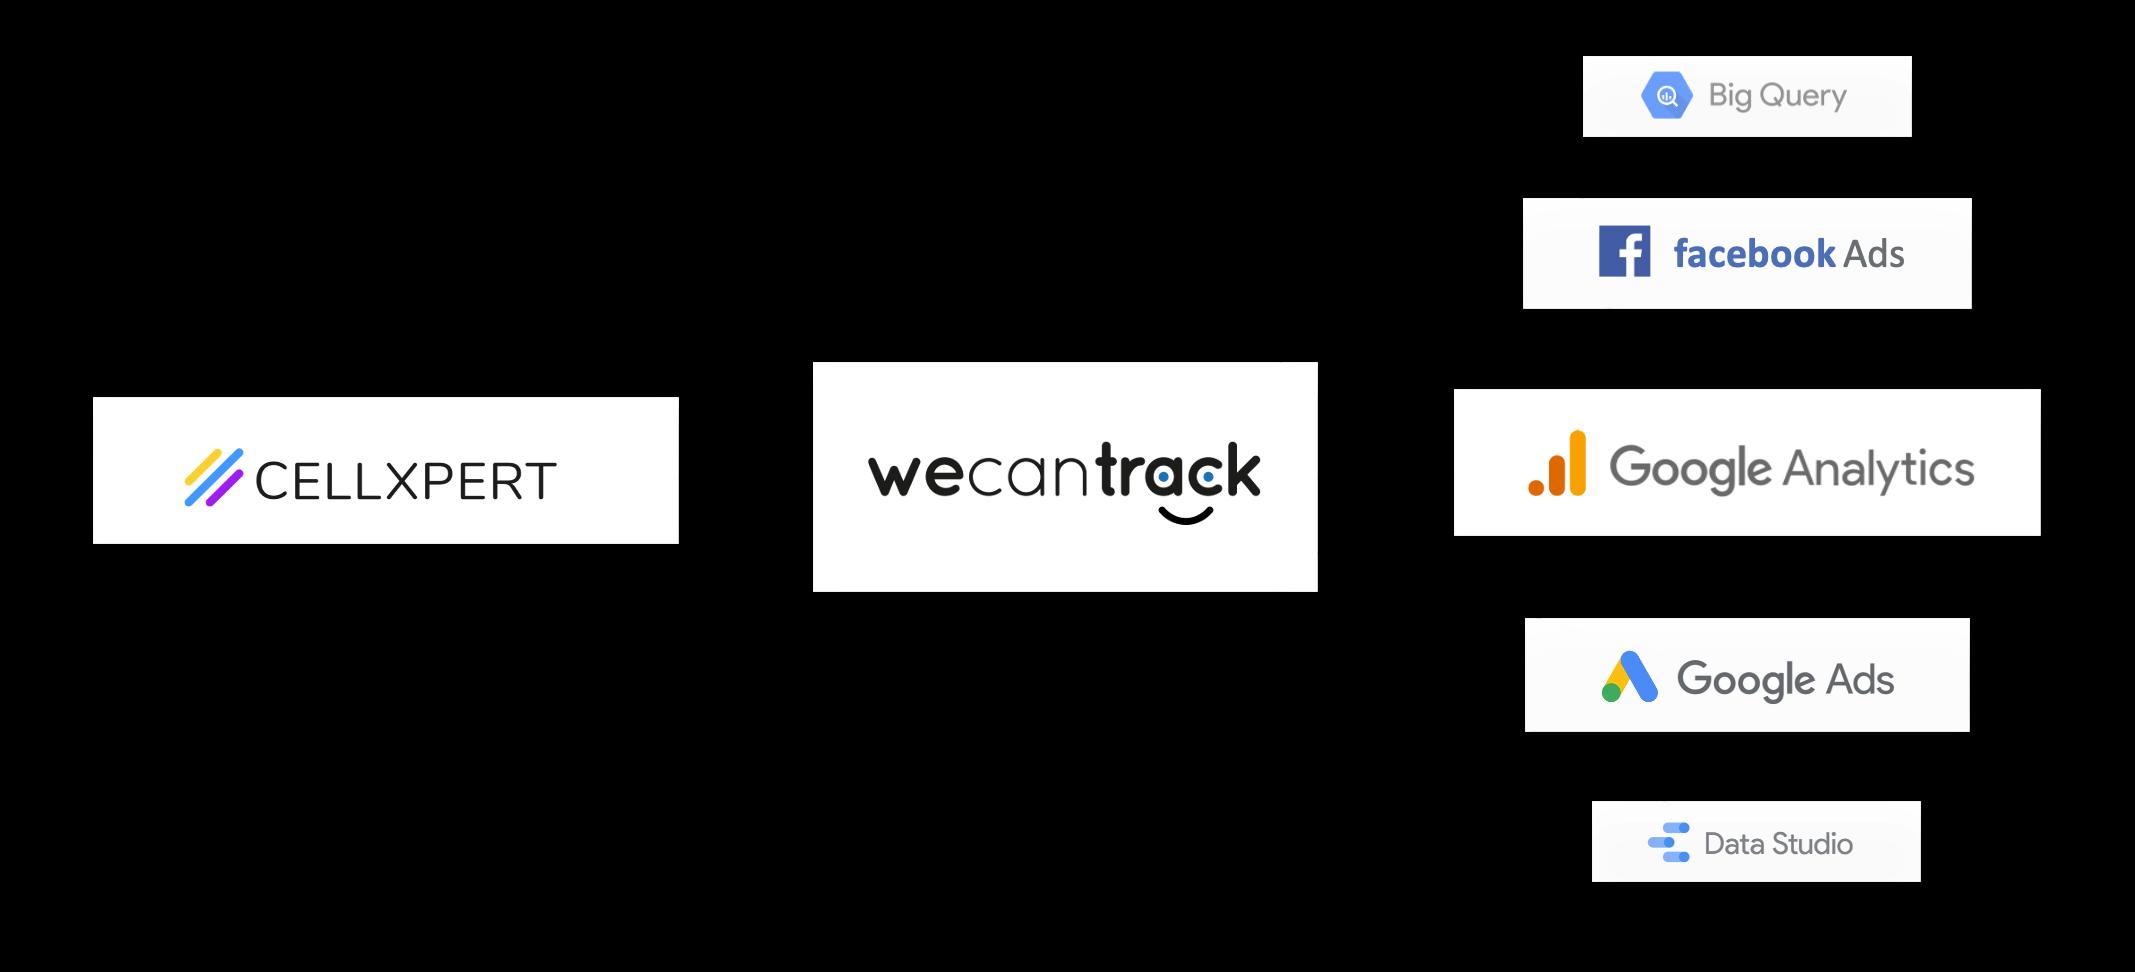 integrate-cellxpert-affiliate-conversions-via-postback-url